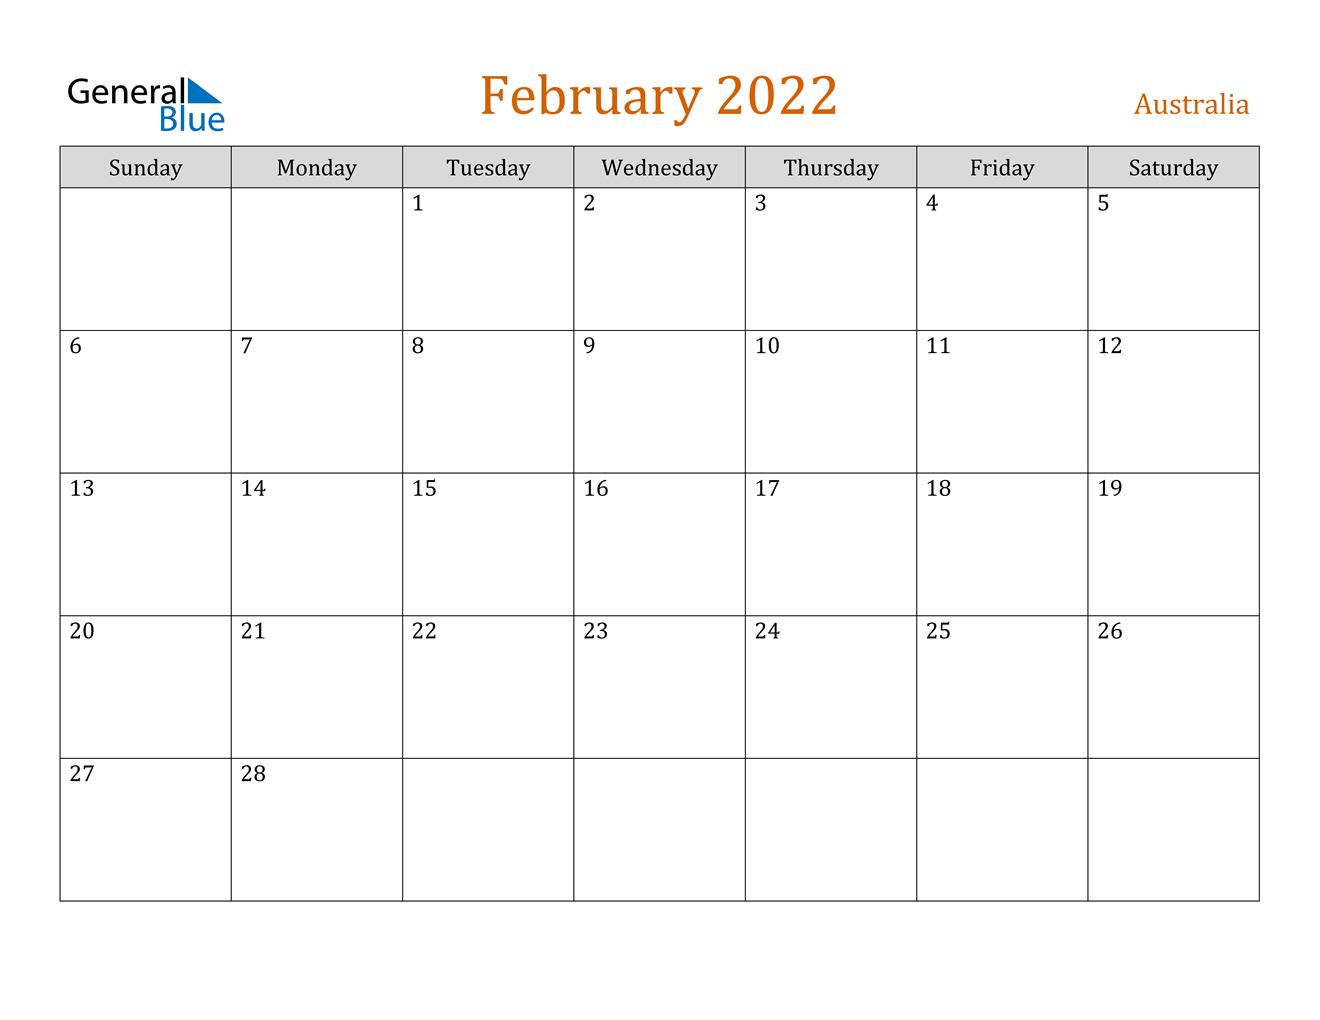 February 2022 Calendar - Australia